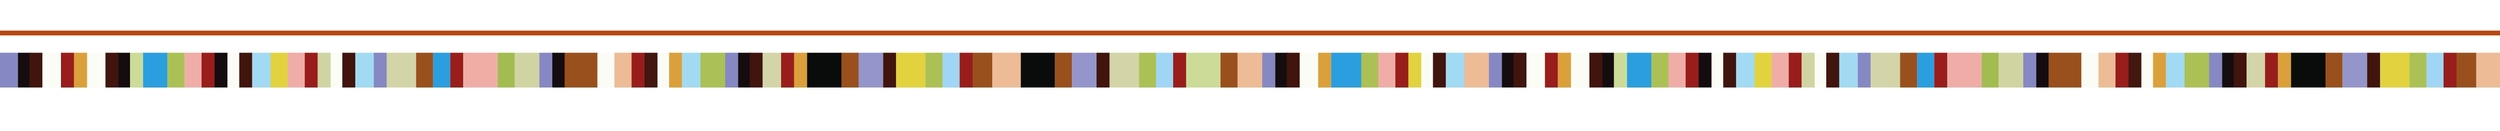 Sineux Website Logo Components 22.jpg